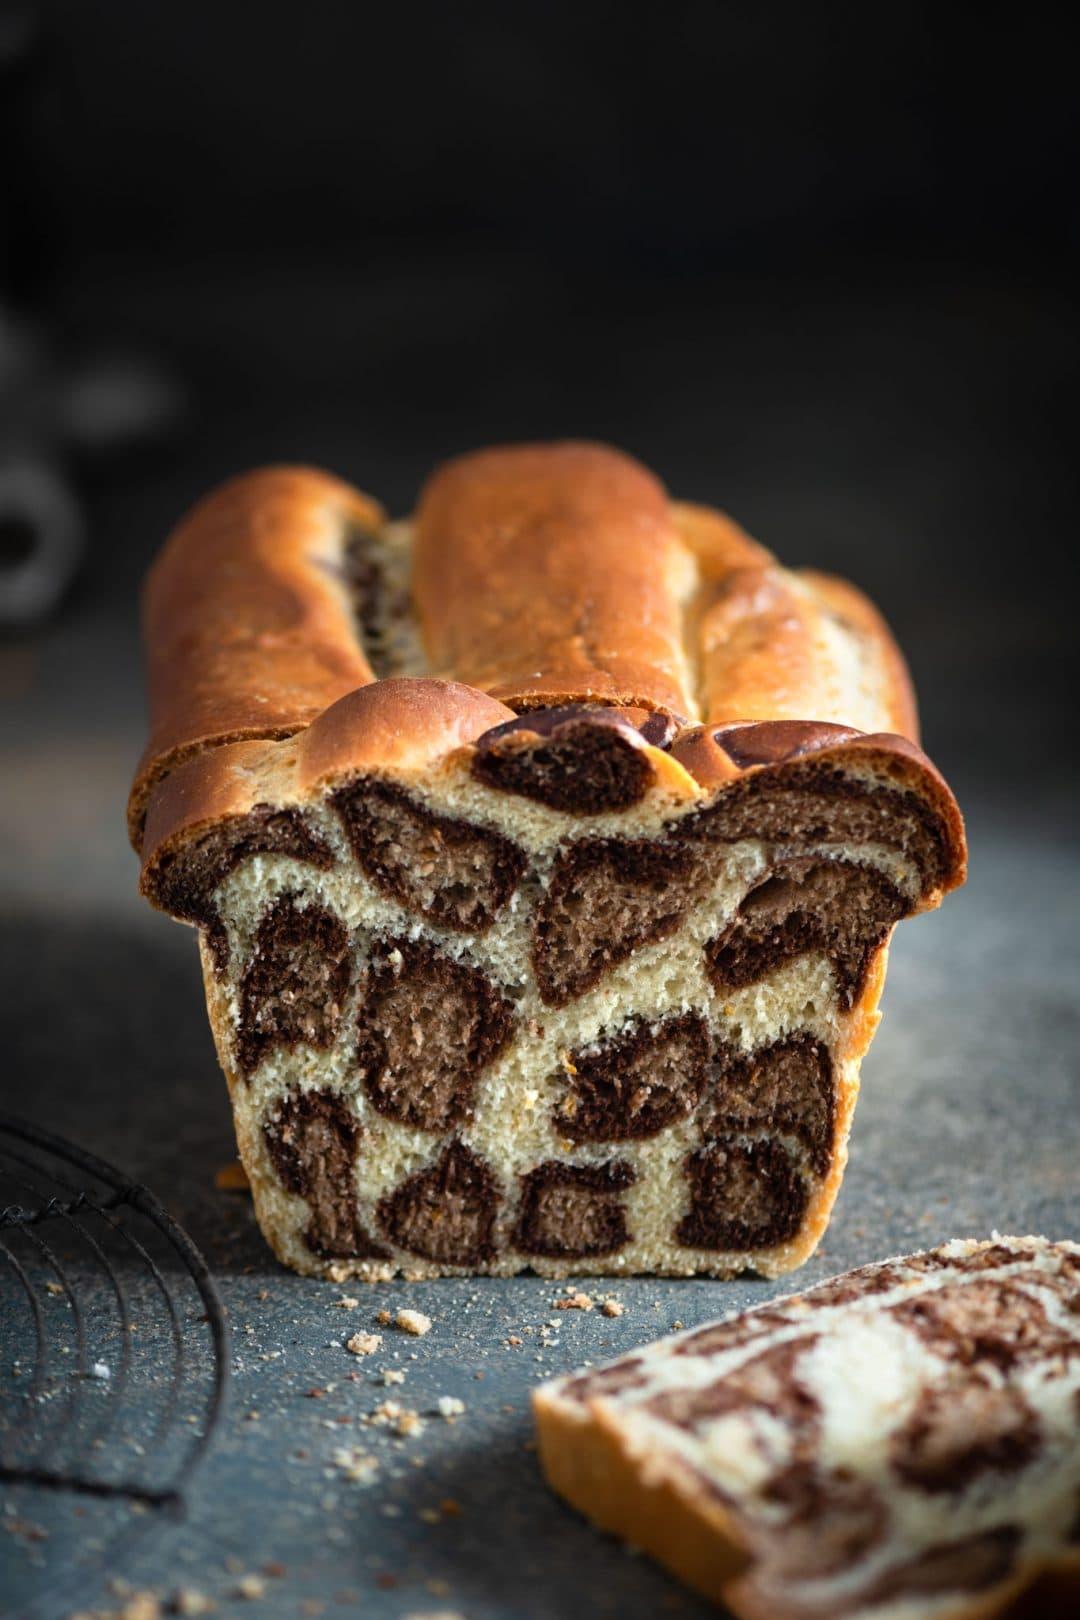 Homemade Chocolate Orange Leopard Milk Bread.